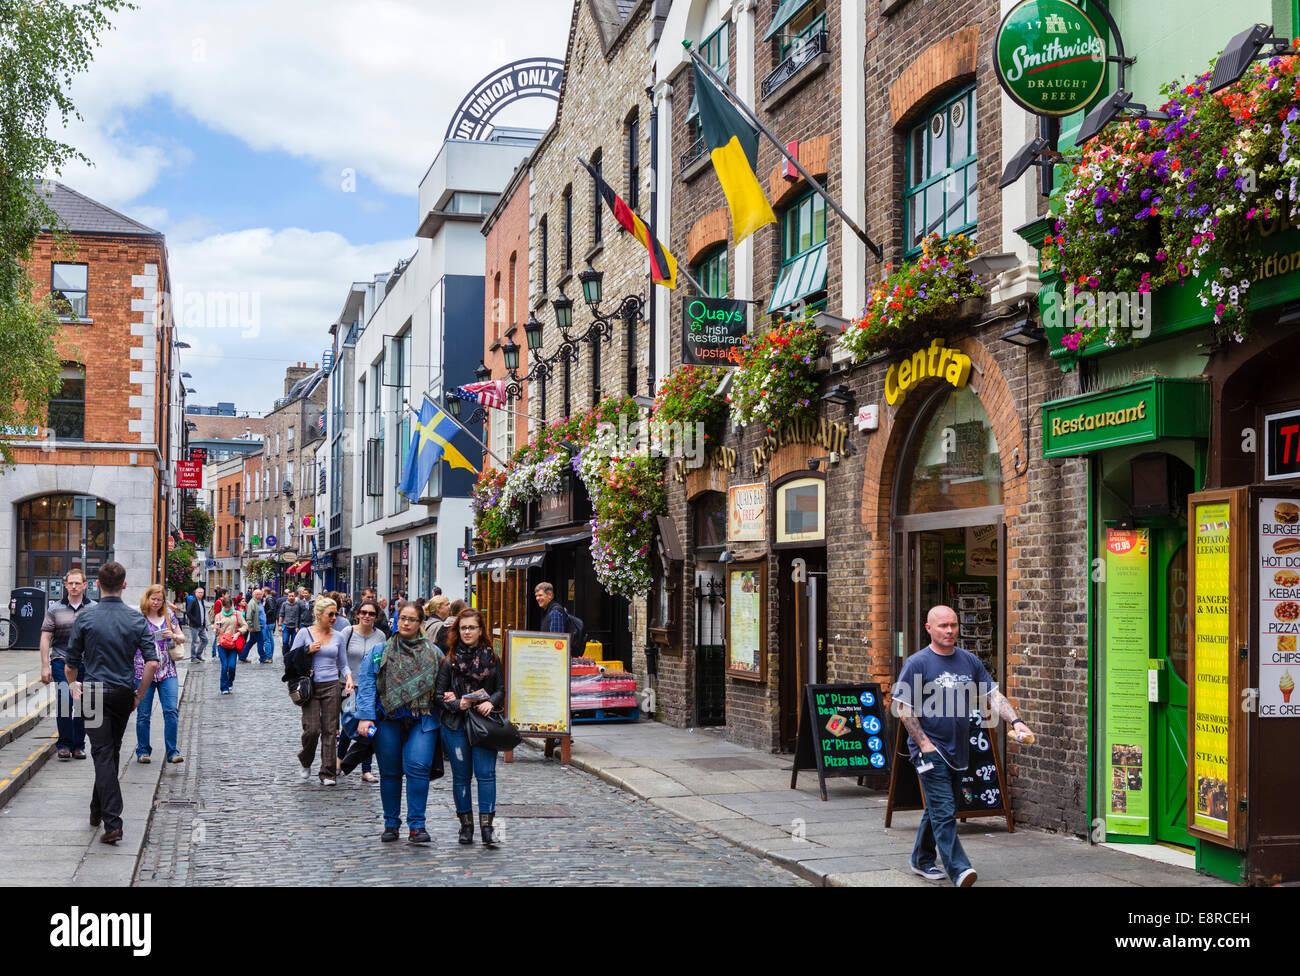 d4c1671108729 Pubs, restaurants and bars on Temple Bar in the city centre, Dublin City,